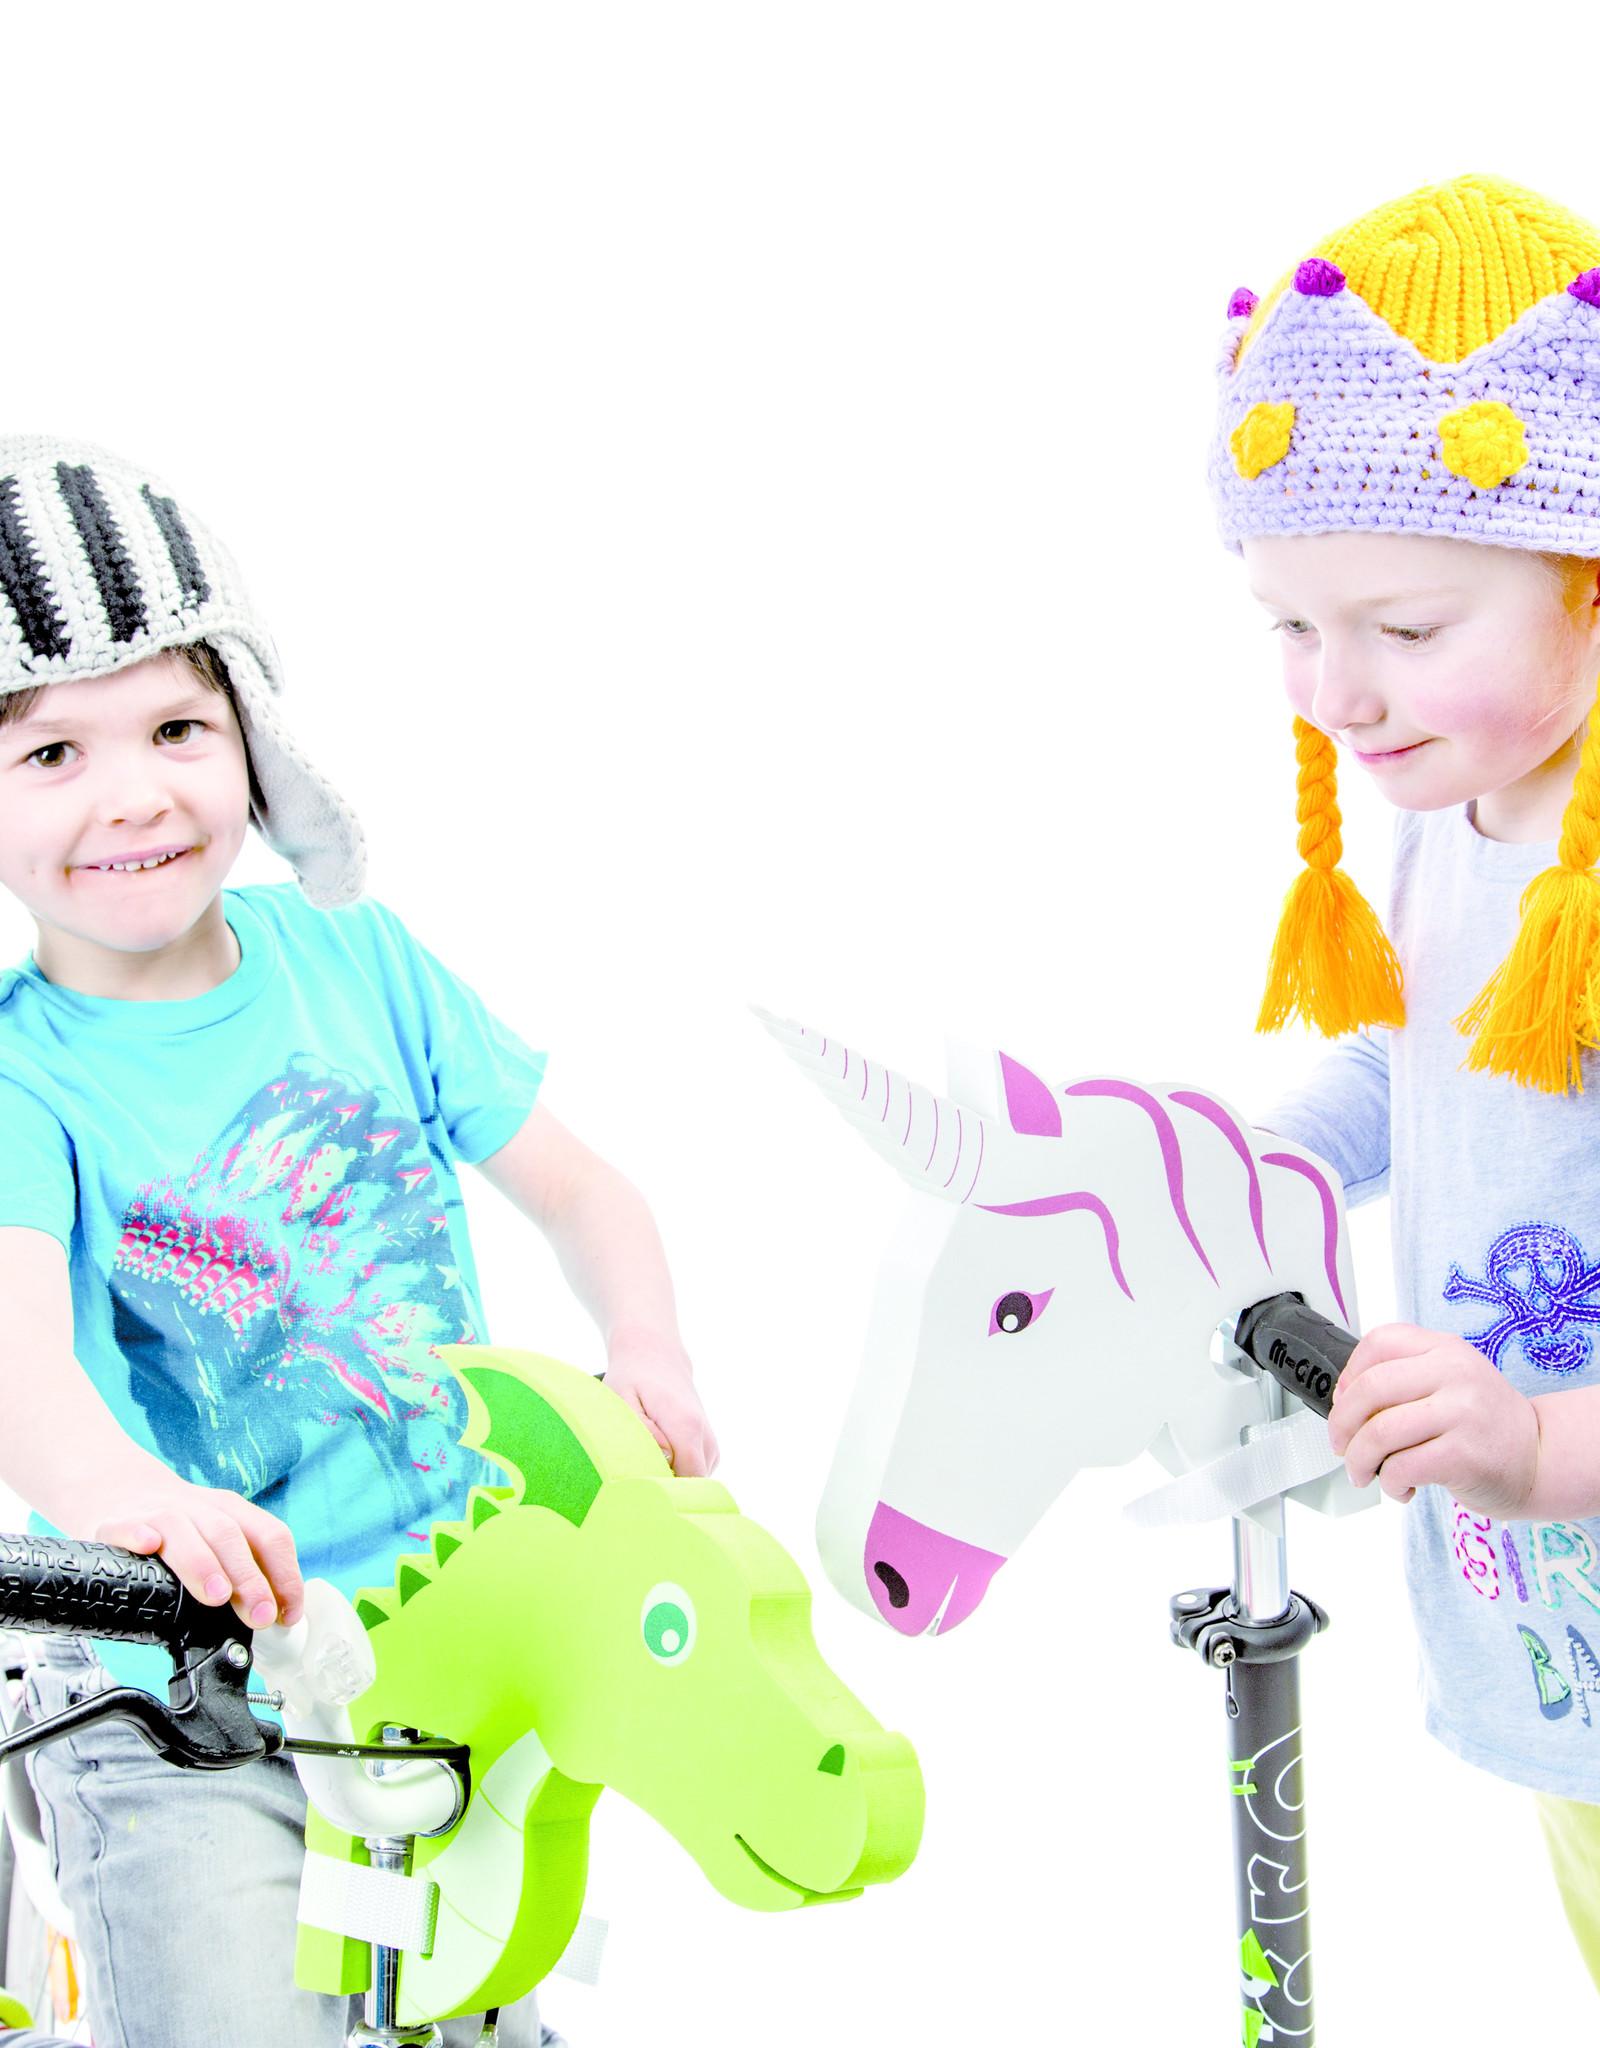 Donkey Products BIKE ANIMAL VOOR OP JE STUUR - DRAAK